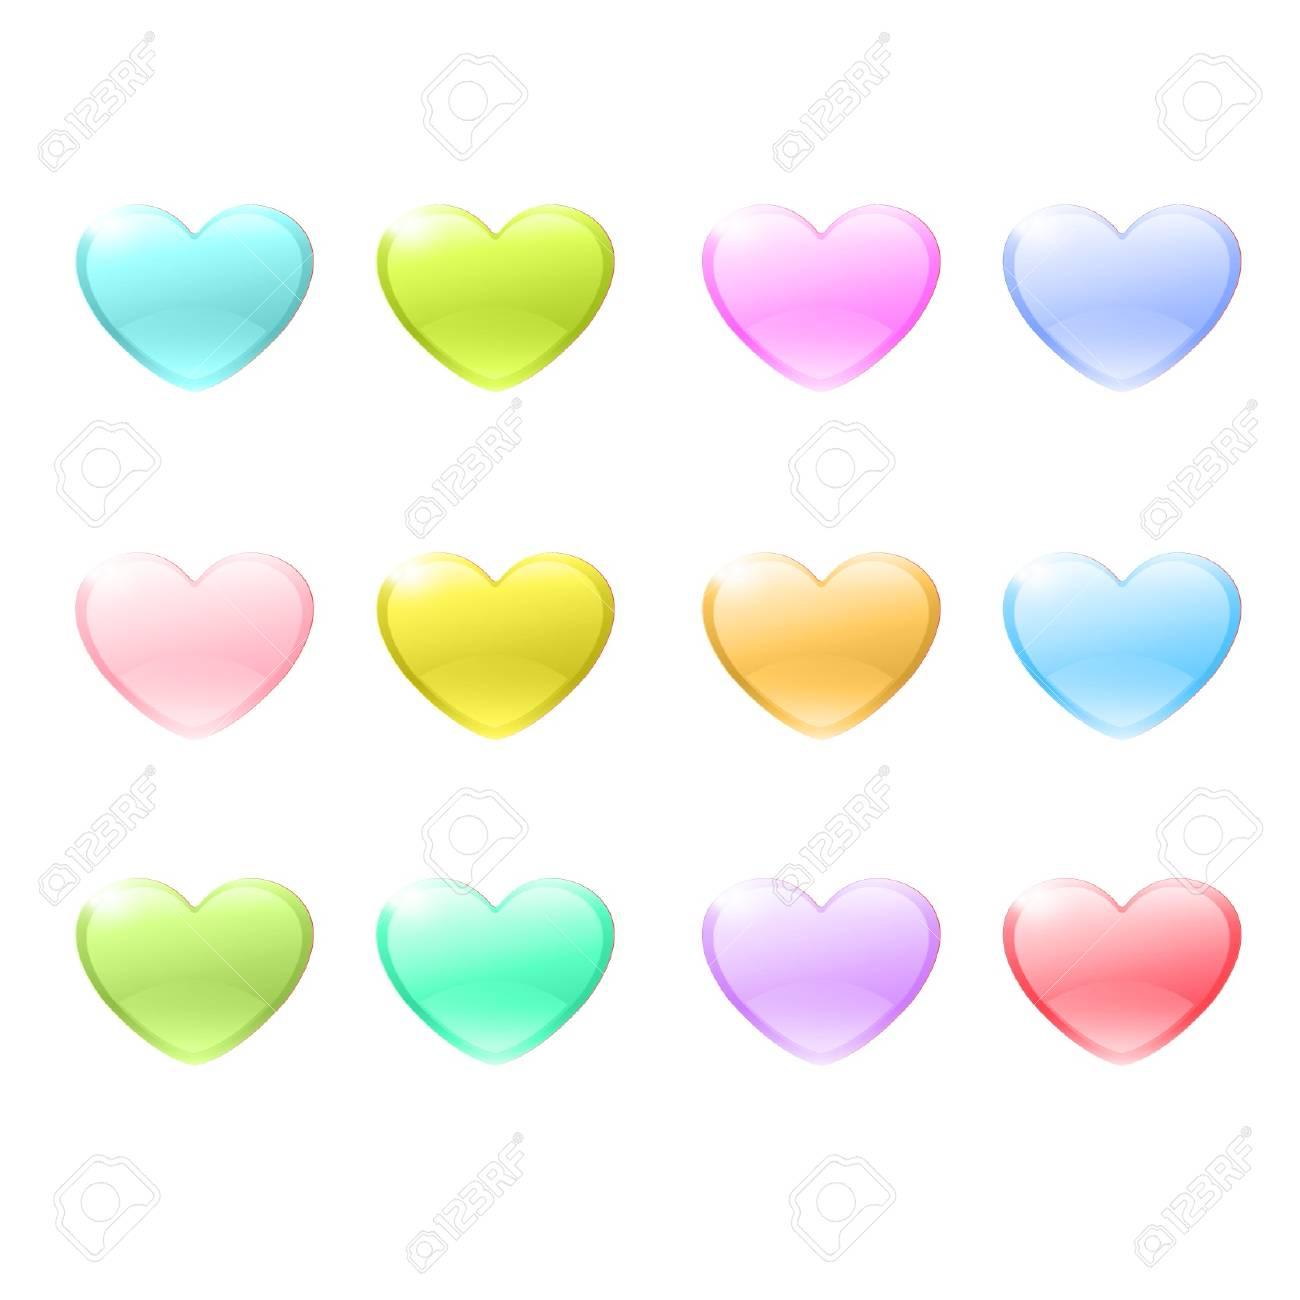 Icon of colorful hearts design Stock Vector - 17150308